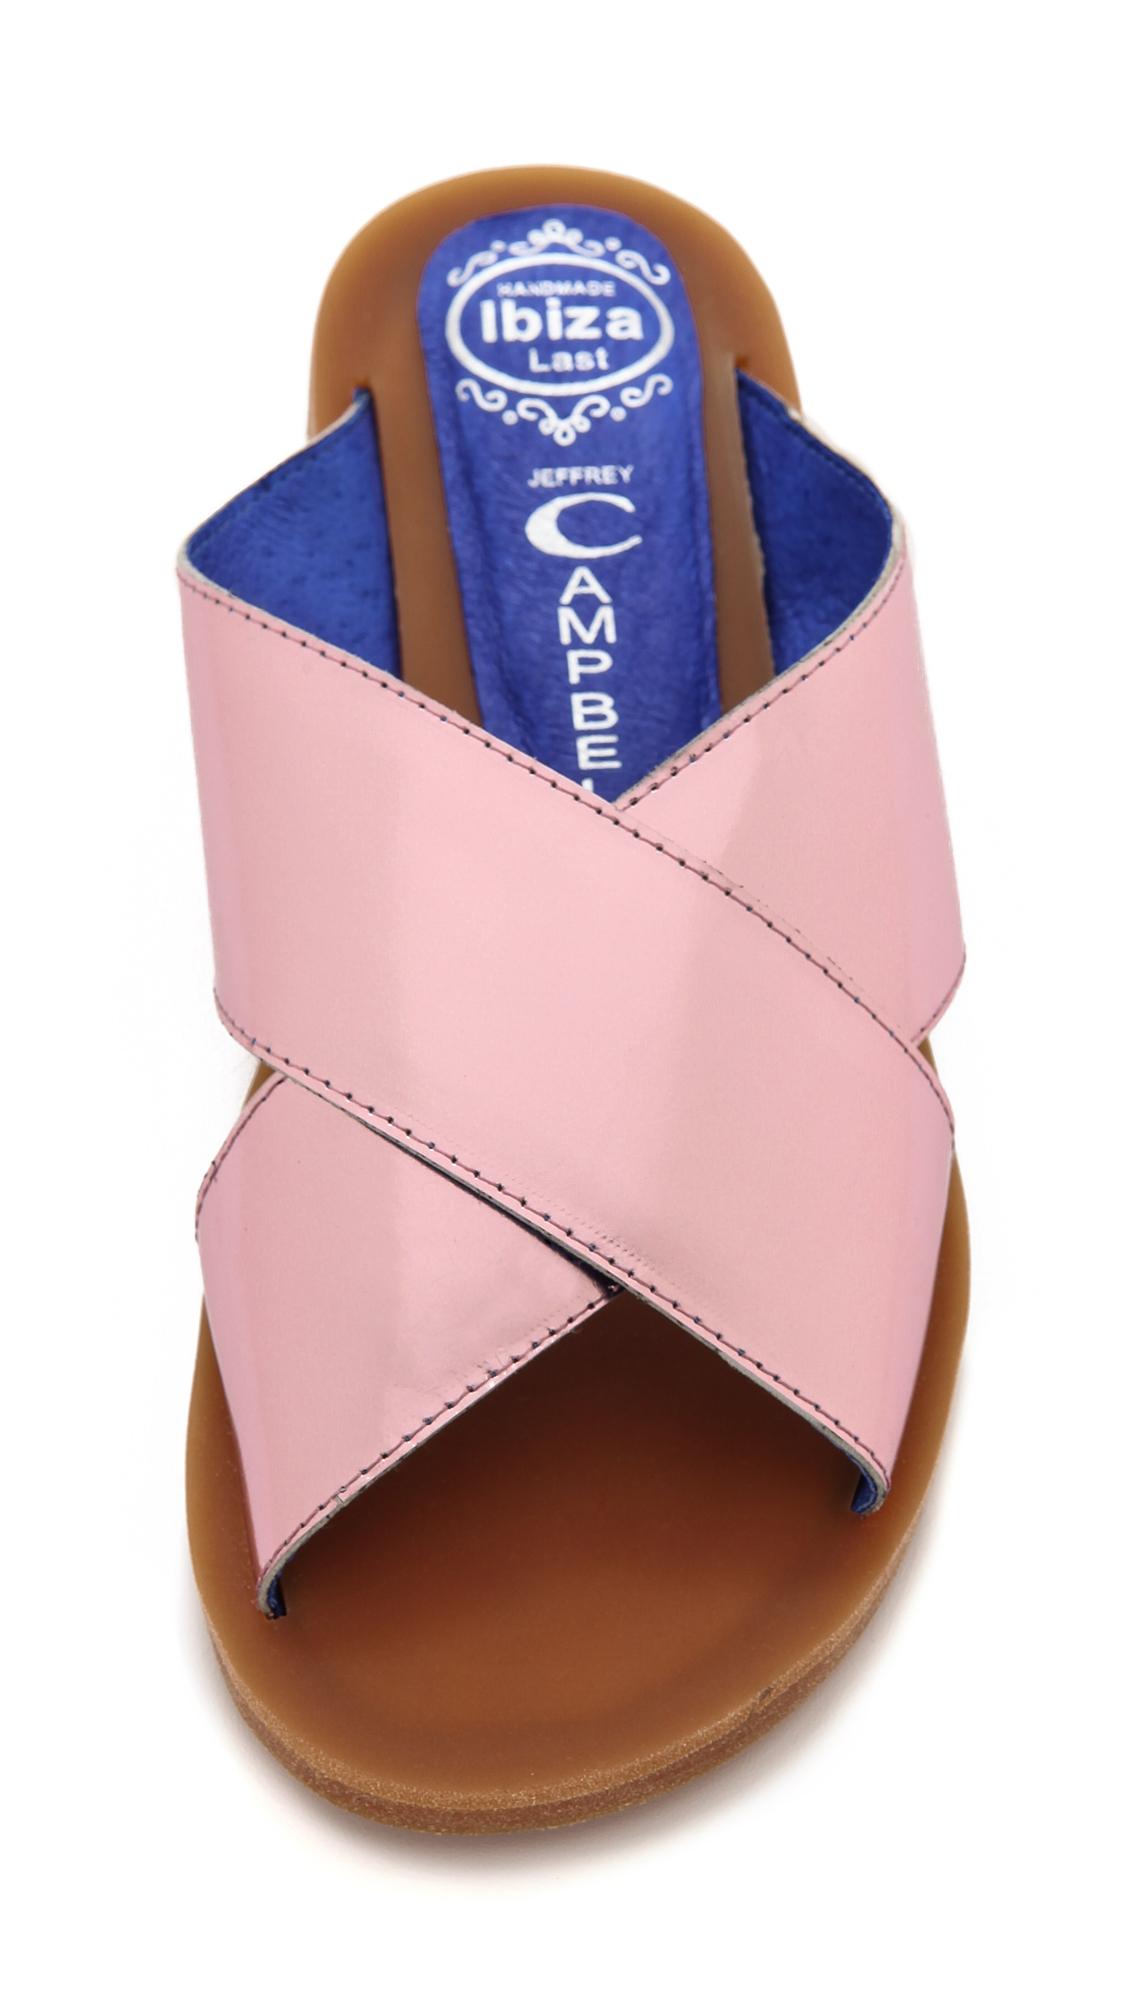 Jeffrey Campbell Caprese Crisscross Slide Sandals Rose